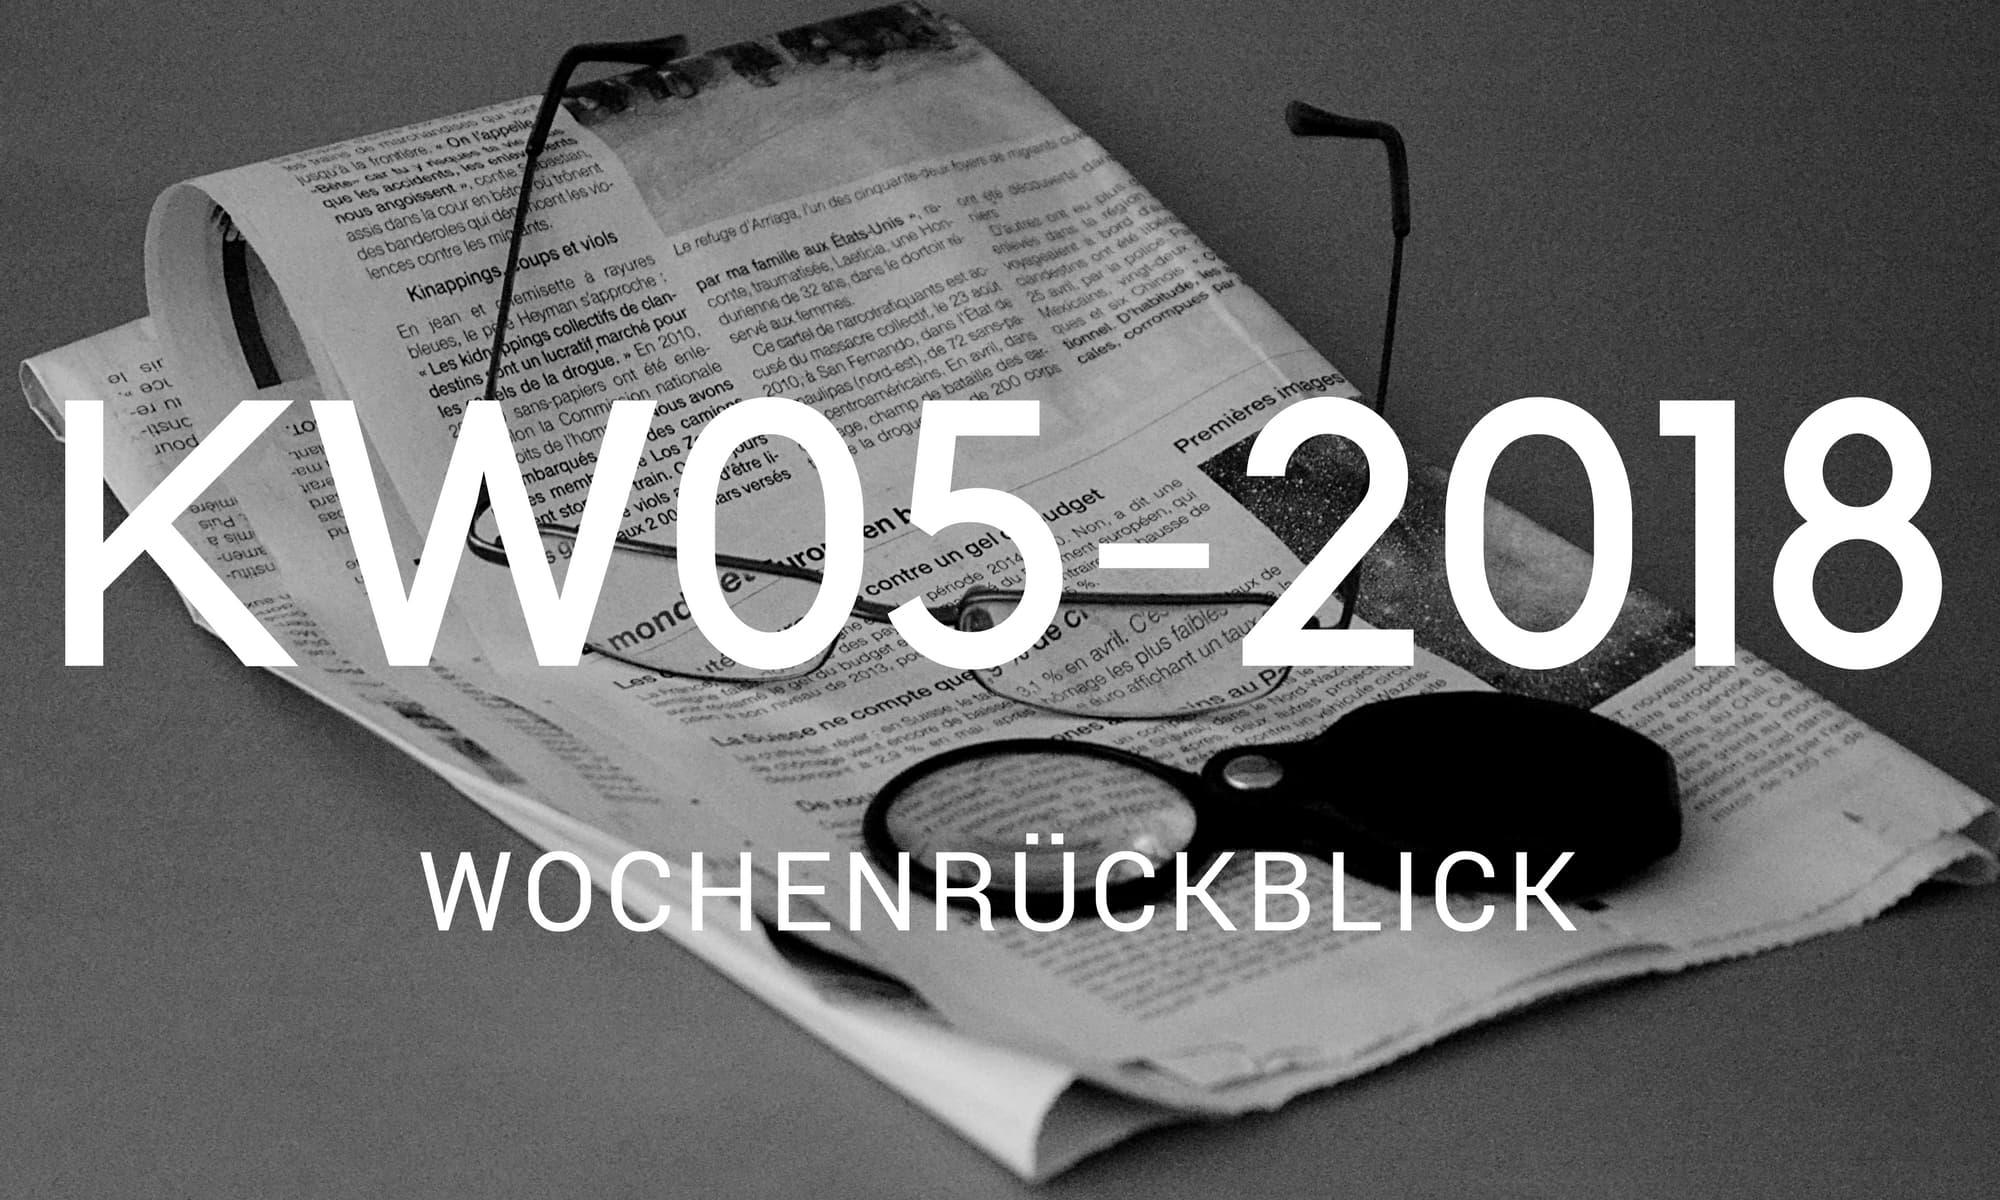 wochenrueckblick campingnews KW05 2018